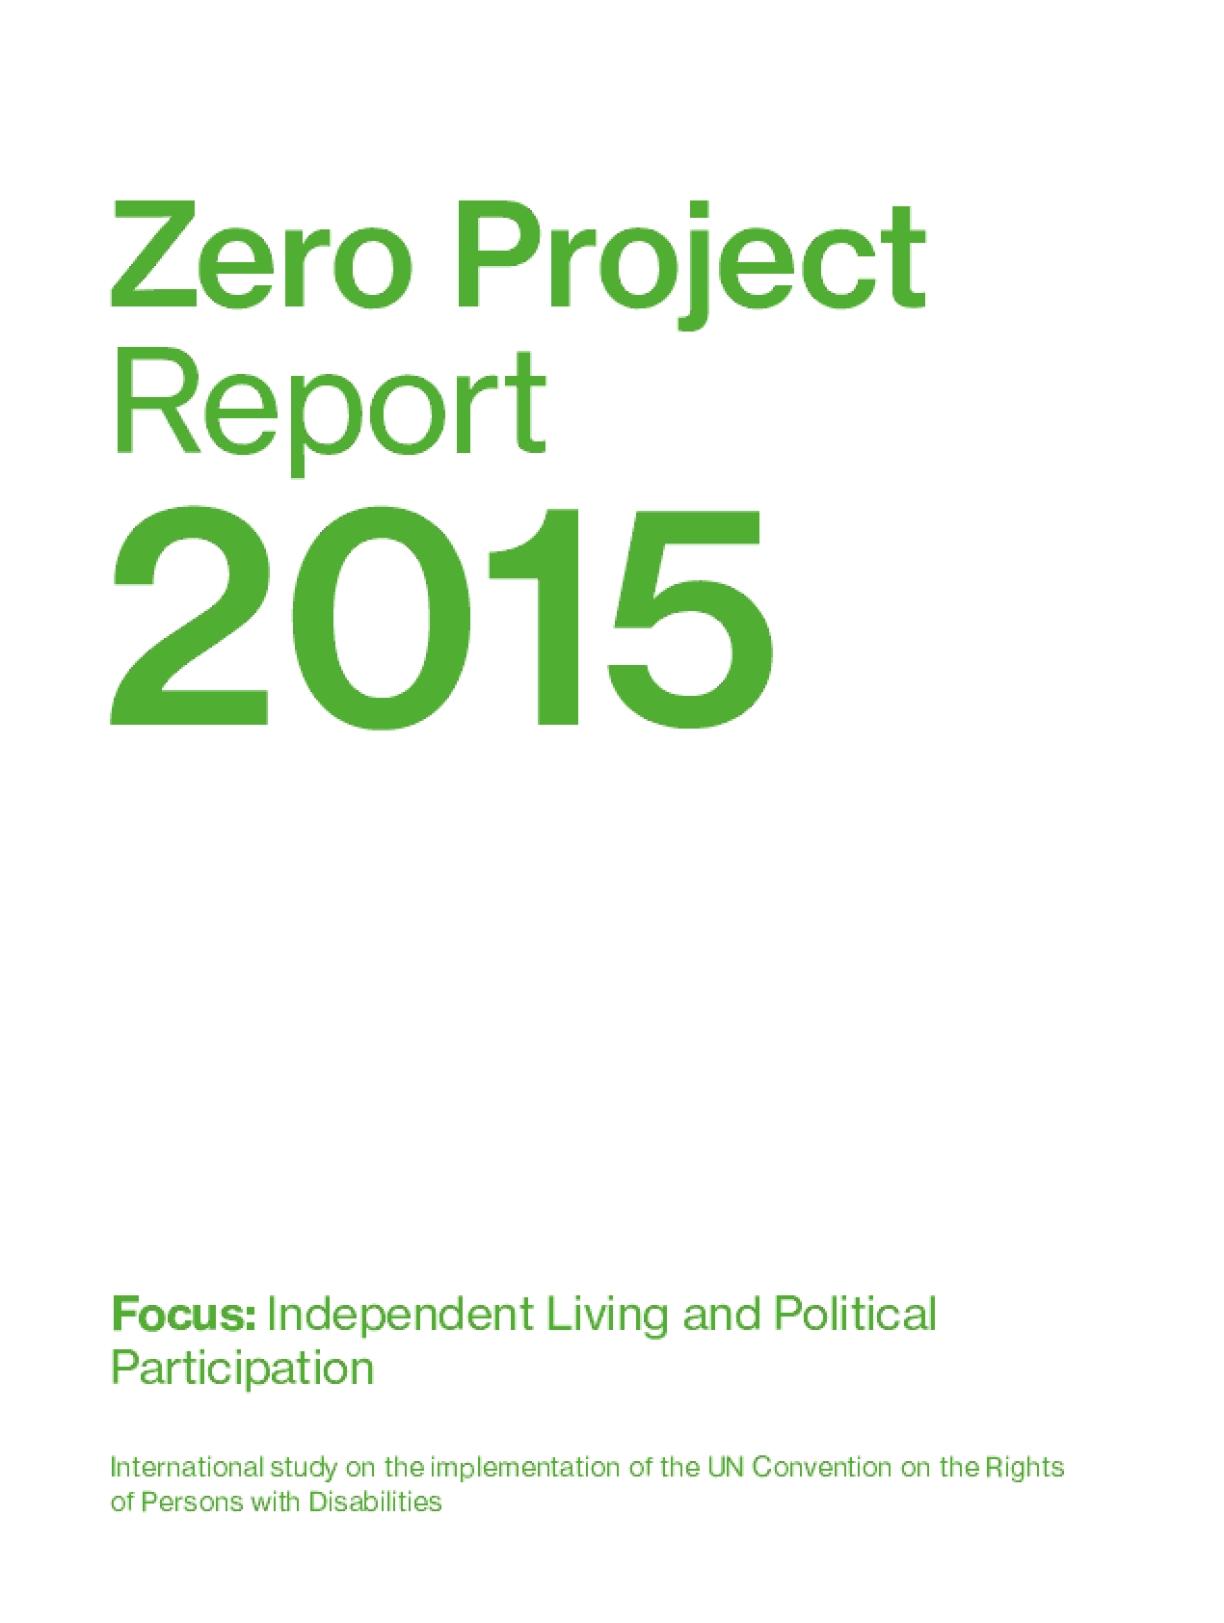 Zero Project Report 2015